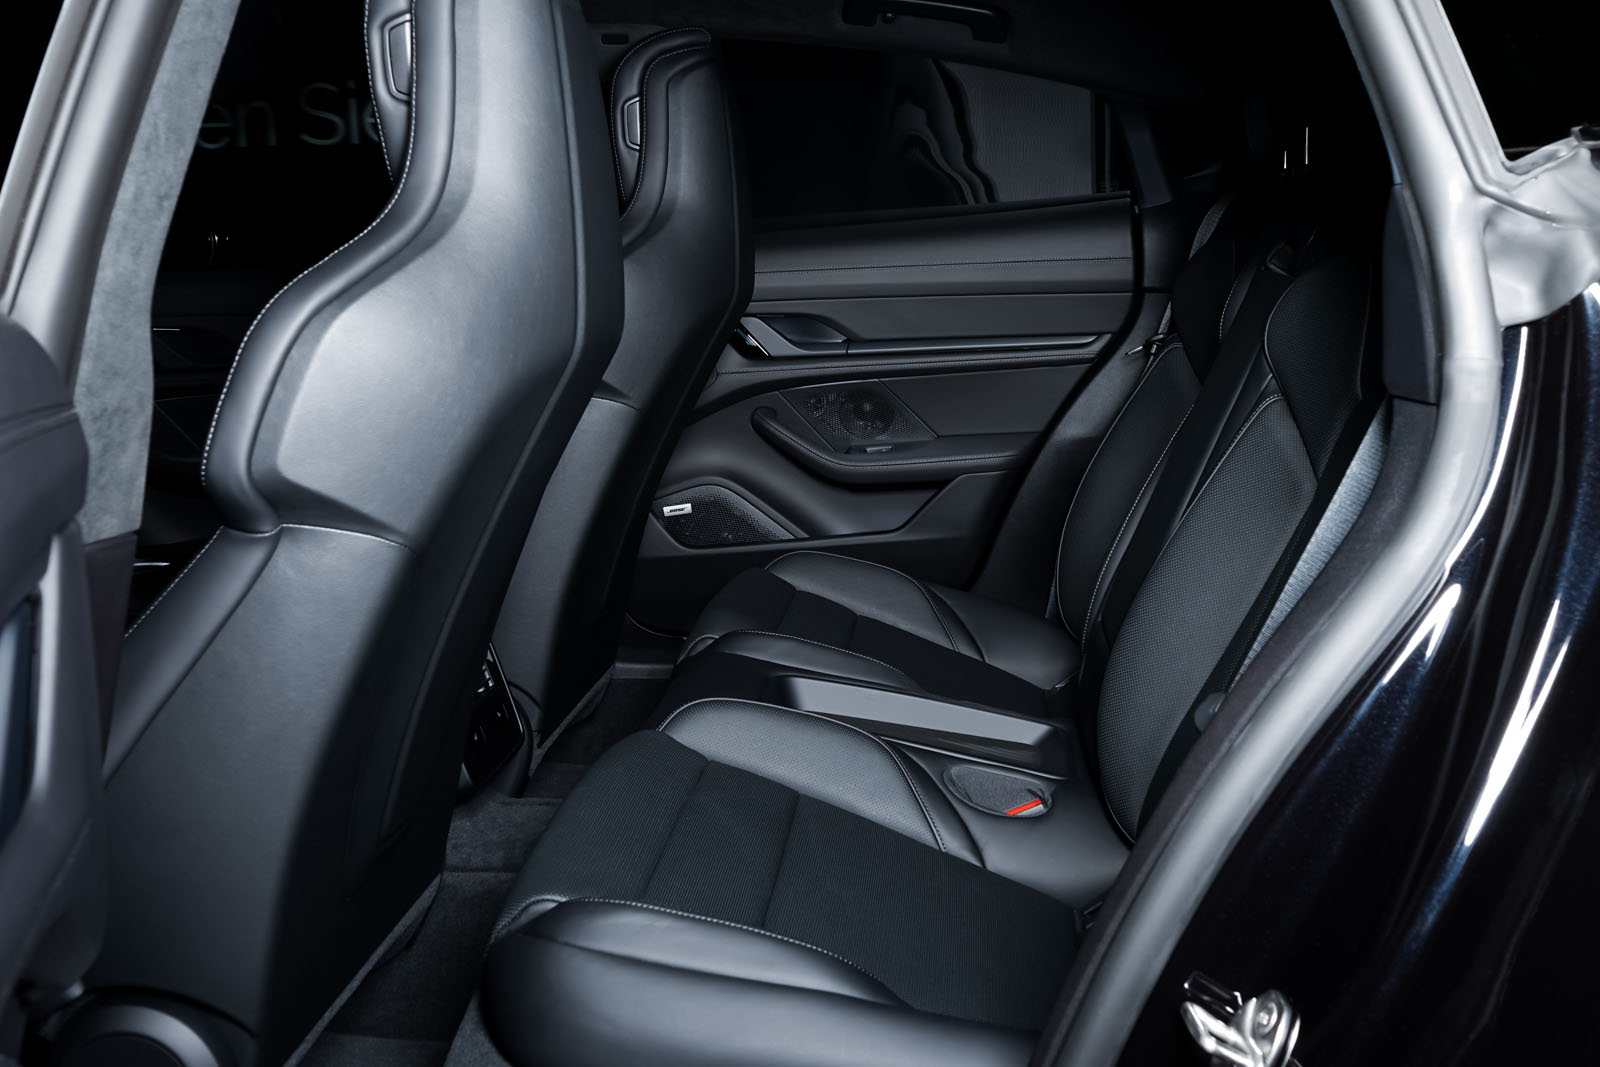 Porsche_Taycan_Turbo_Schwarz_Schwarz_POR-8106_6_w